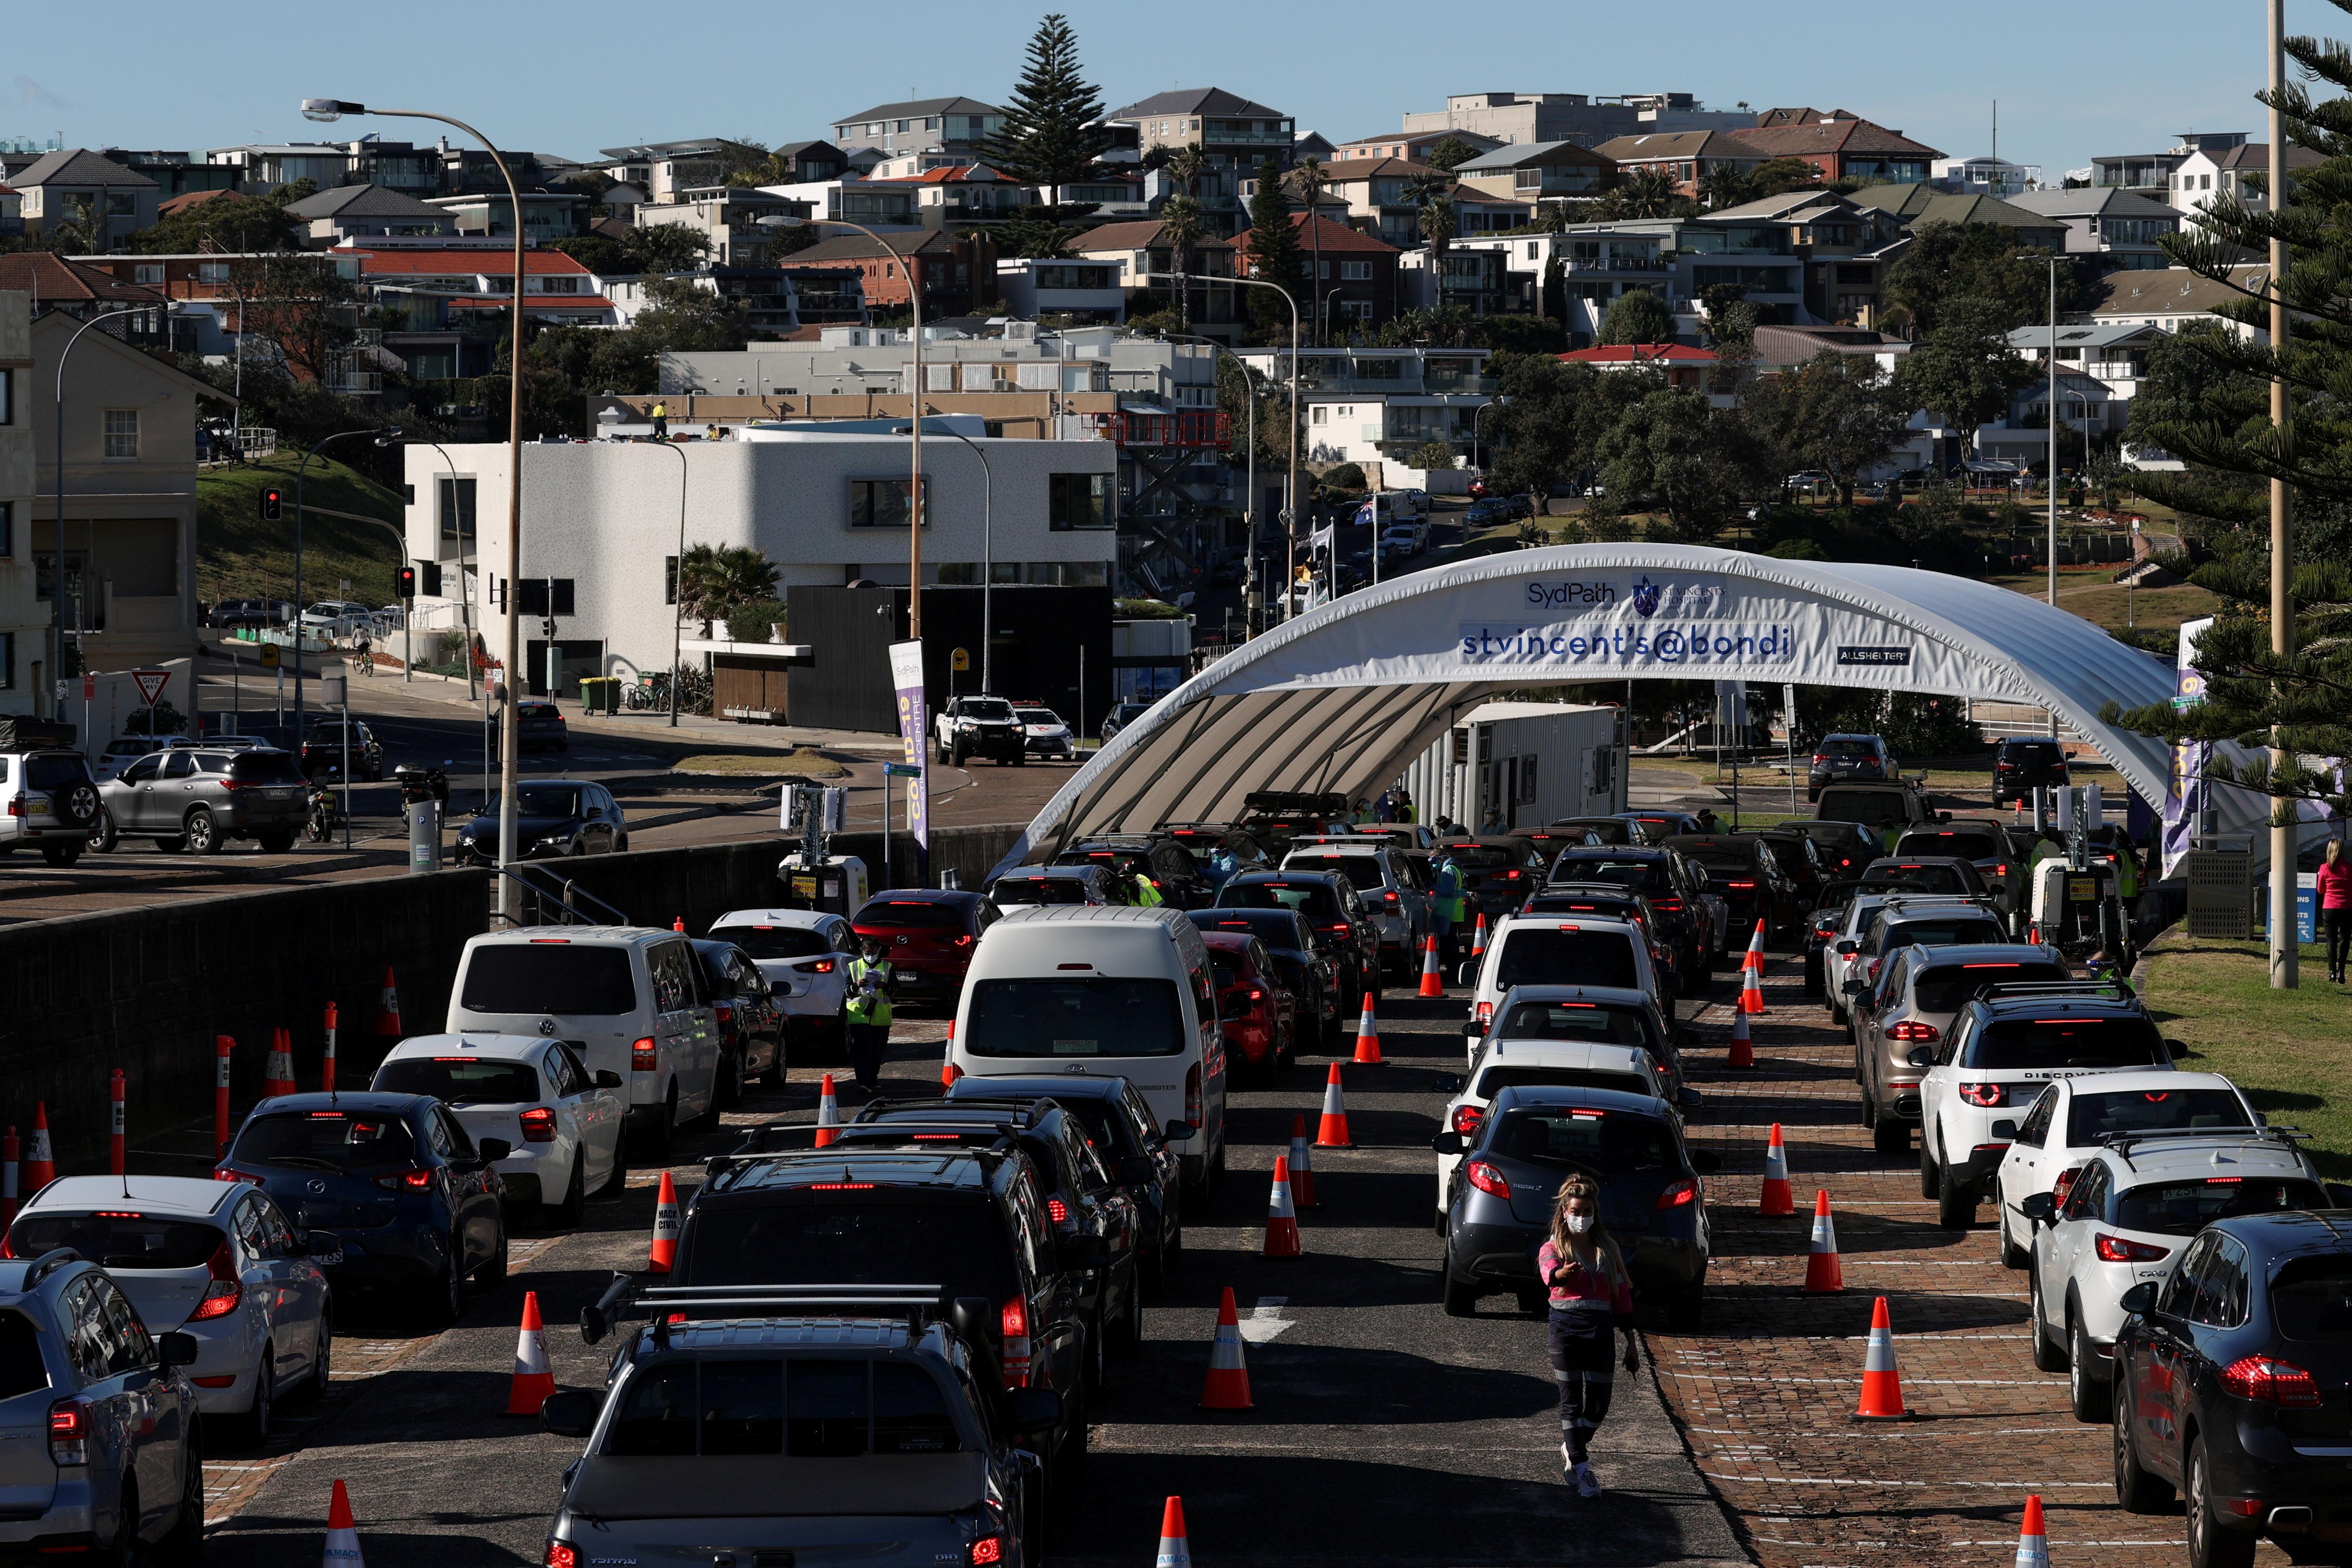 Vehicles wait in line at the Bondi Beach drive-through coronavirus disease (COVID-19) testing centre in the wake of new positive cases in Sydney, Australia, June 17, 2021.  REUTERS/Loren Elliott/File Photo